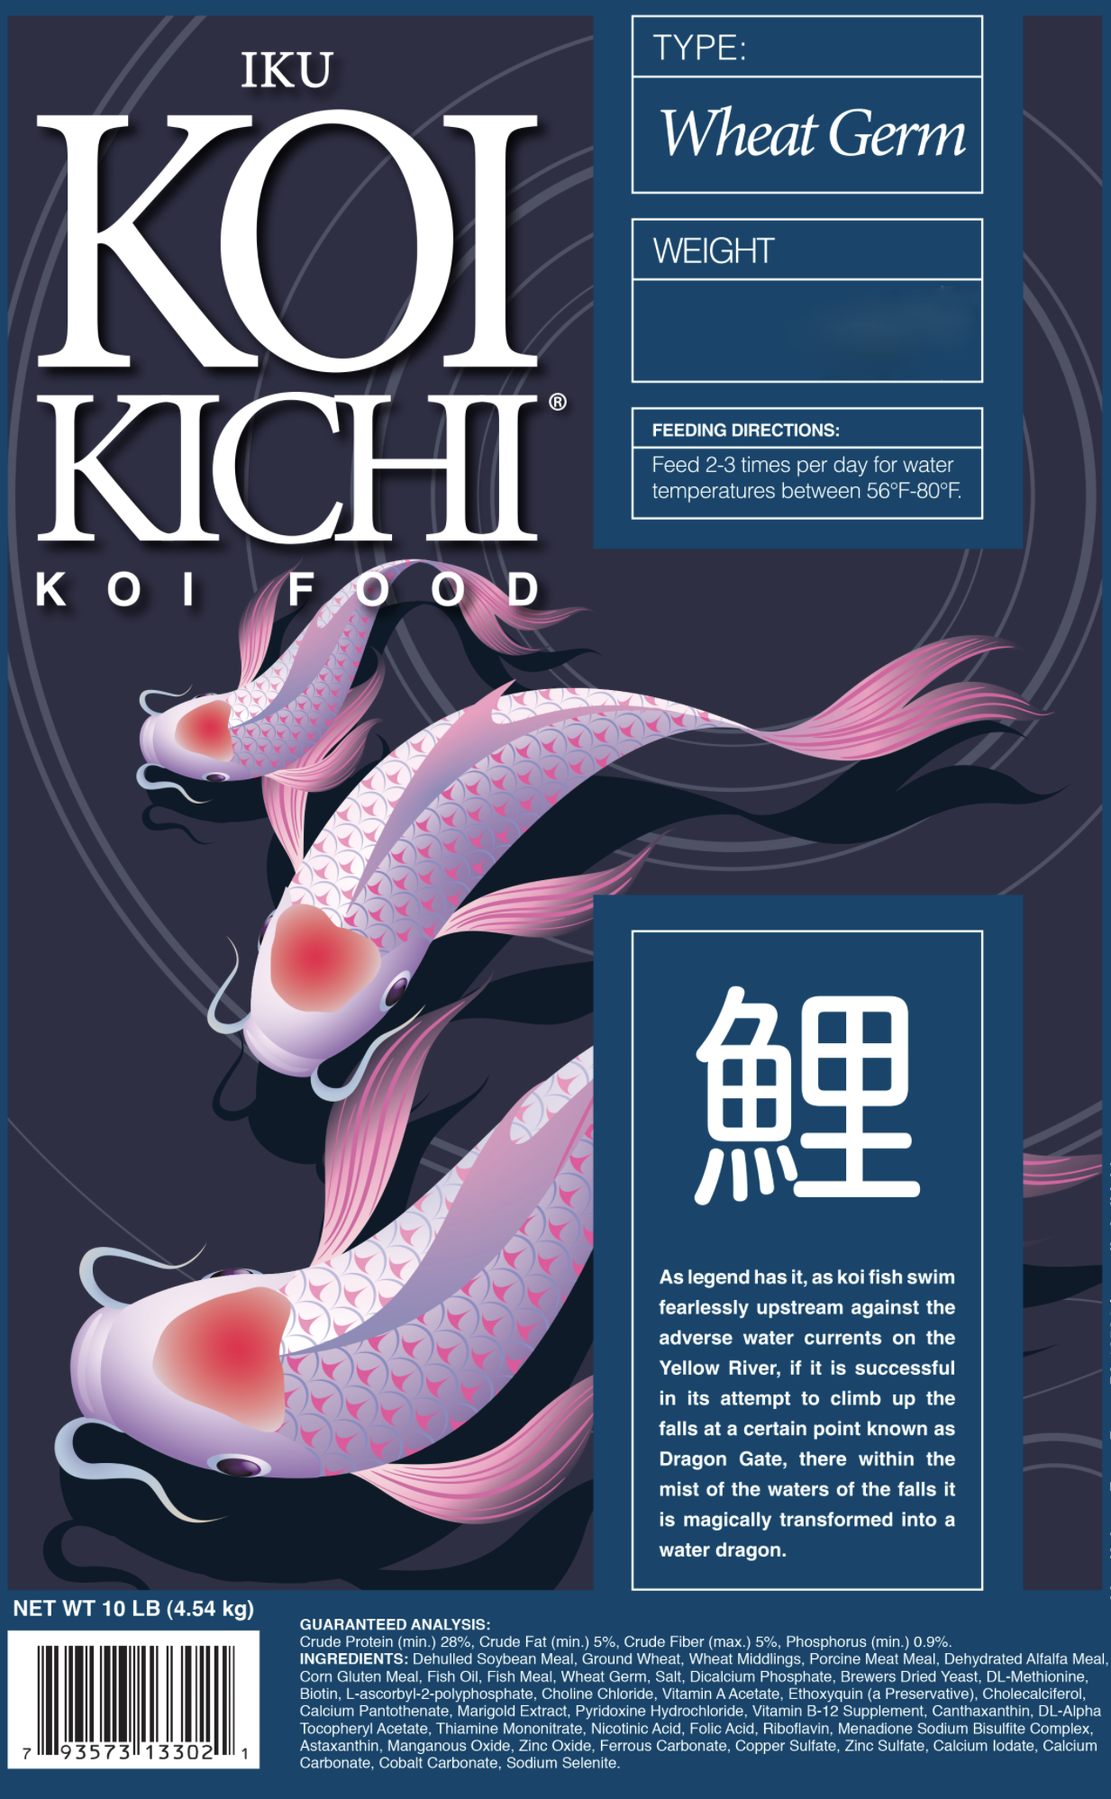 Iku Koi Kichi Wheat Germ Koi Fish Food - 40 lbs.